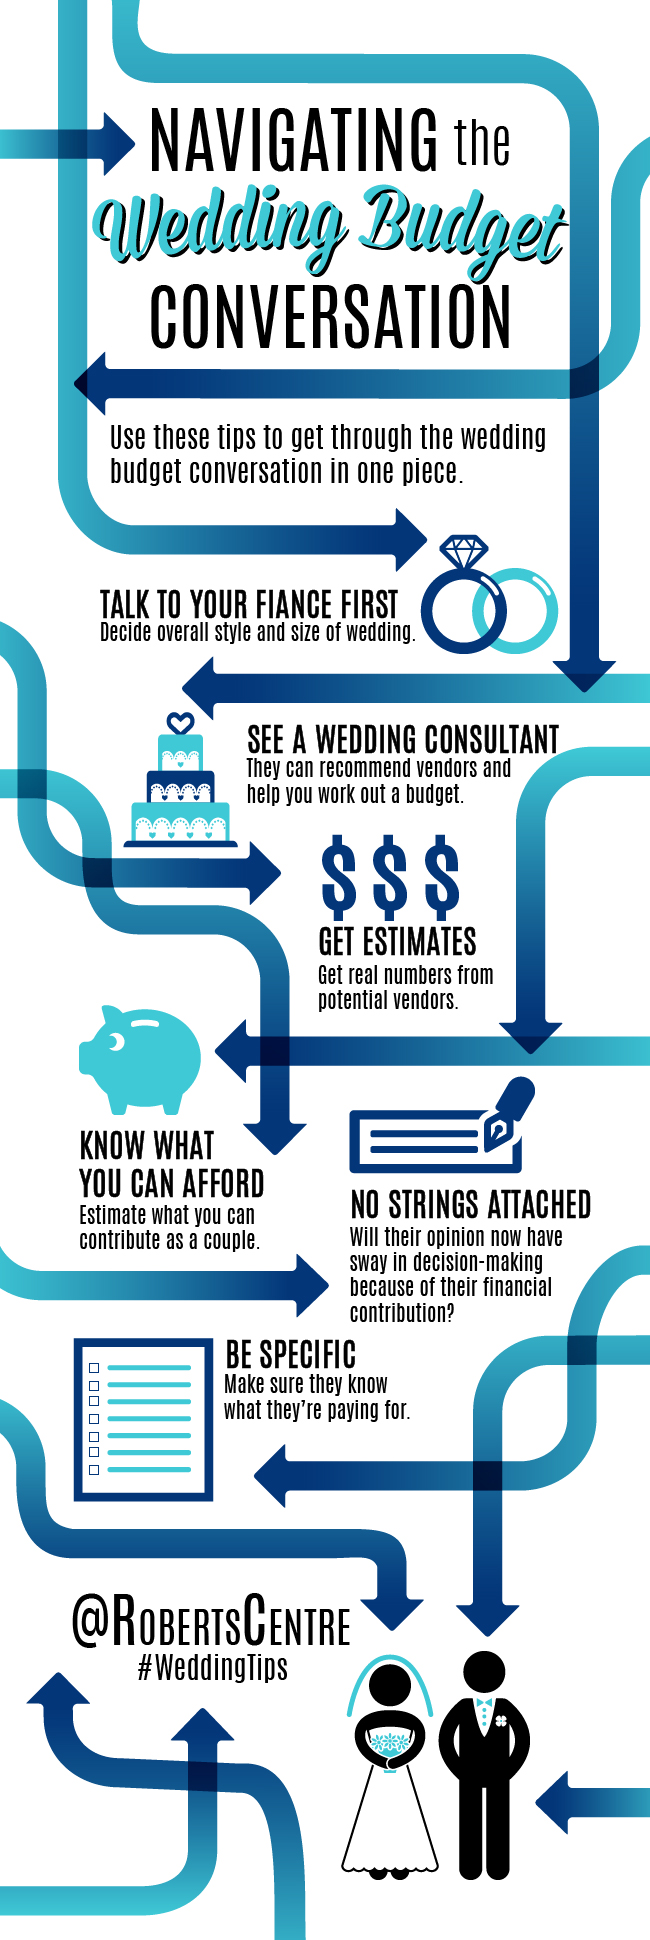 how to navigate the wedding budget conversation wedding budget